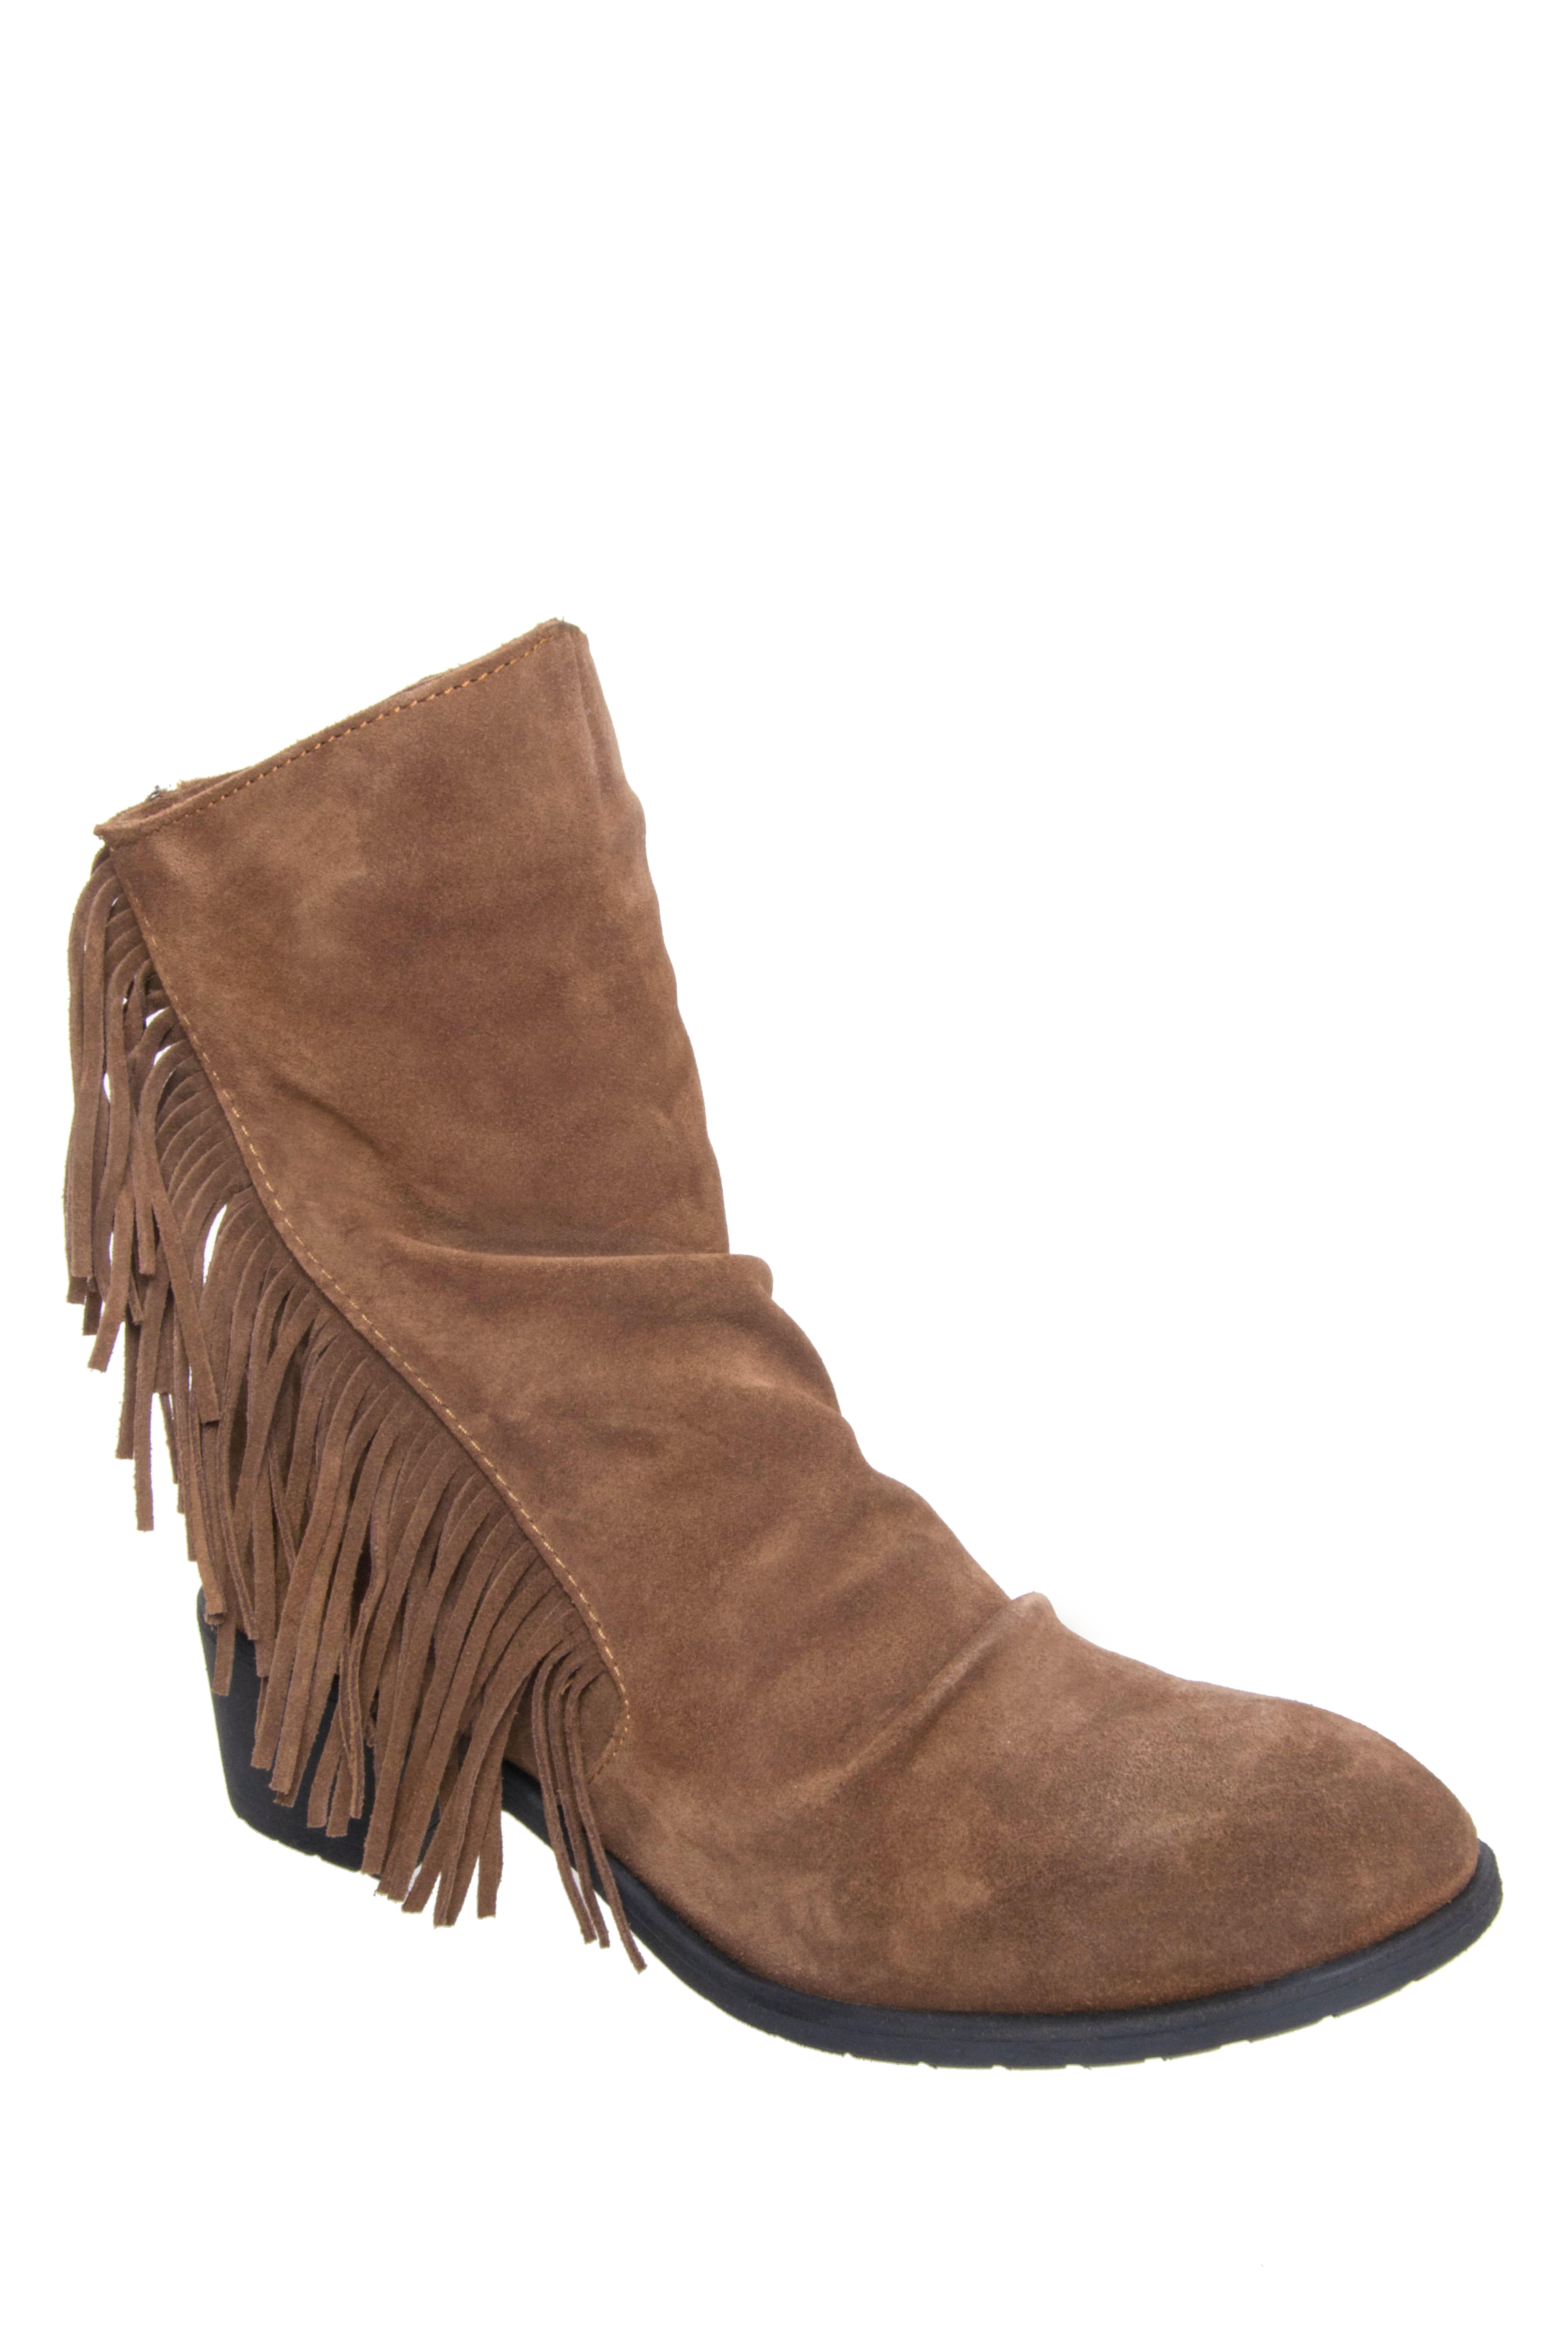 Ethem H401 Mid Heel Boots - Sigaro